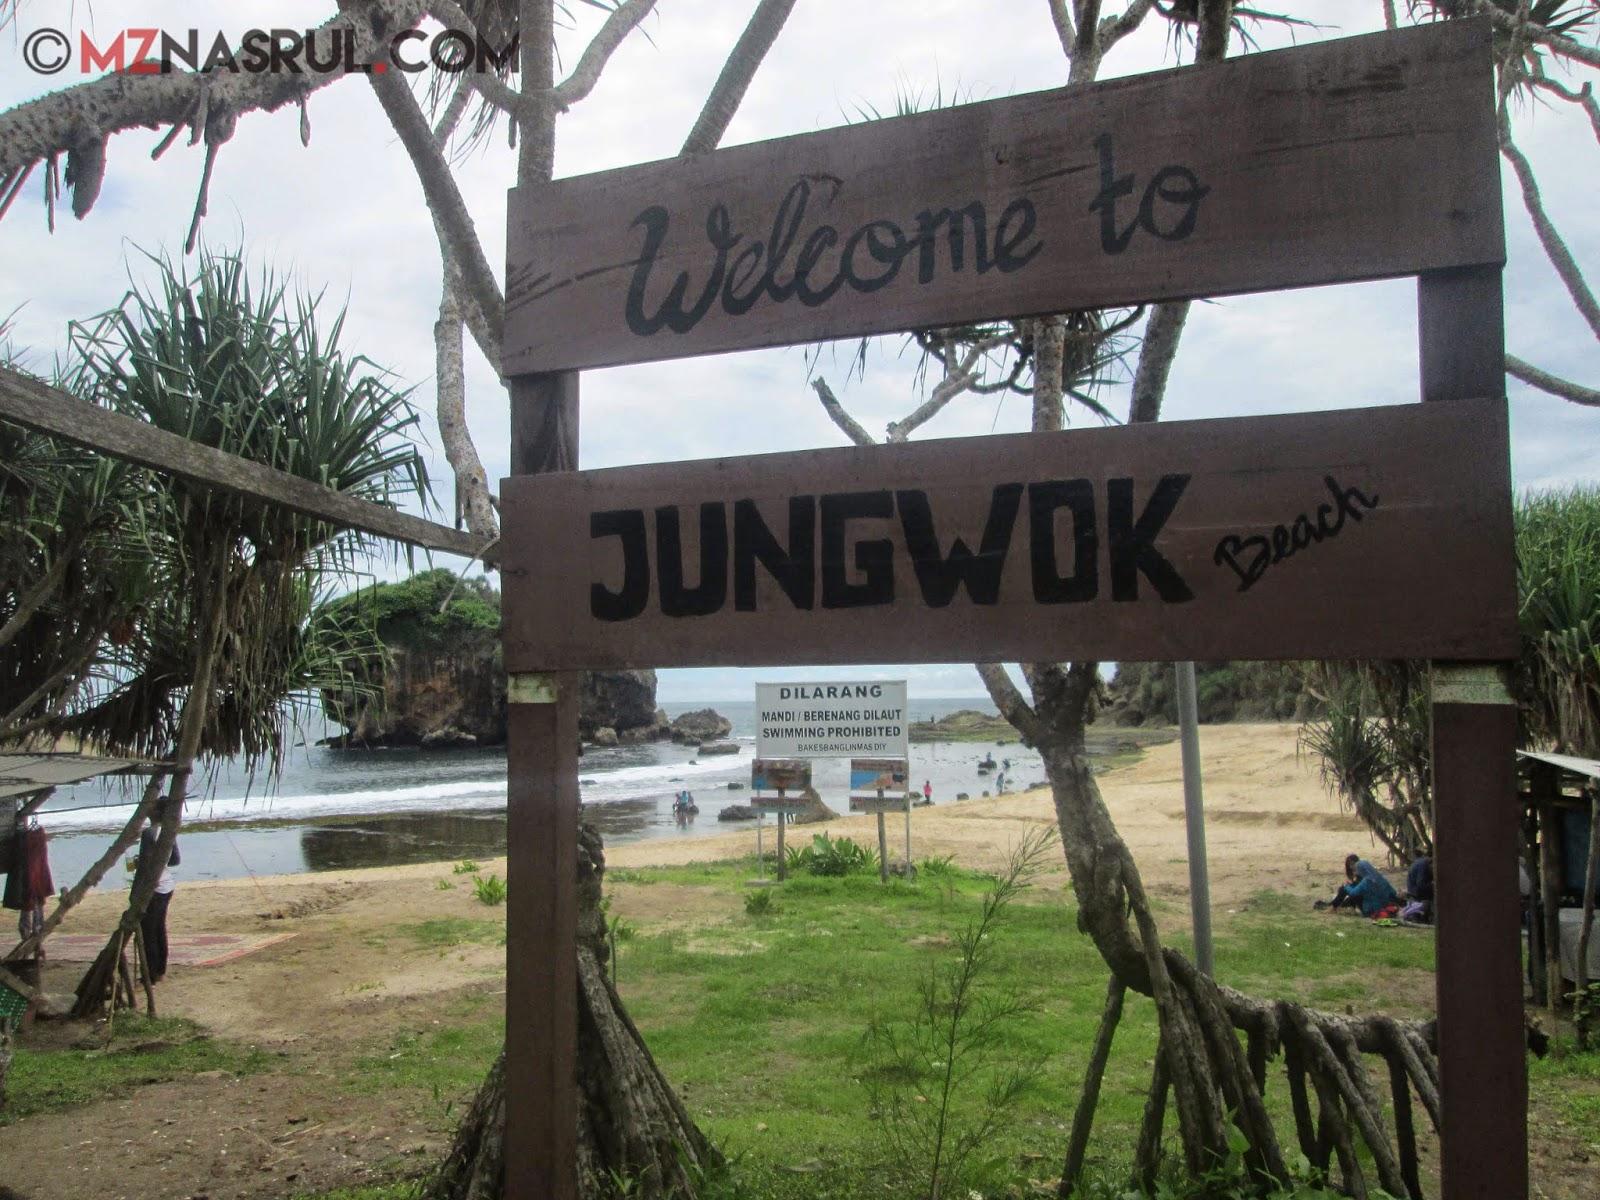 Pantai jungwok wonosari